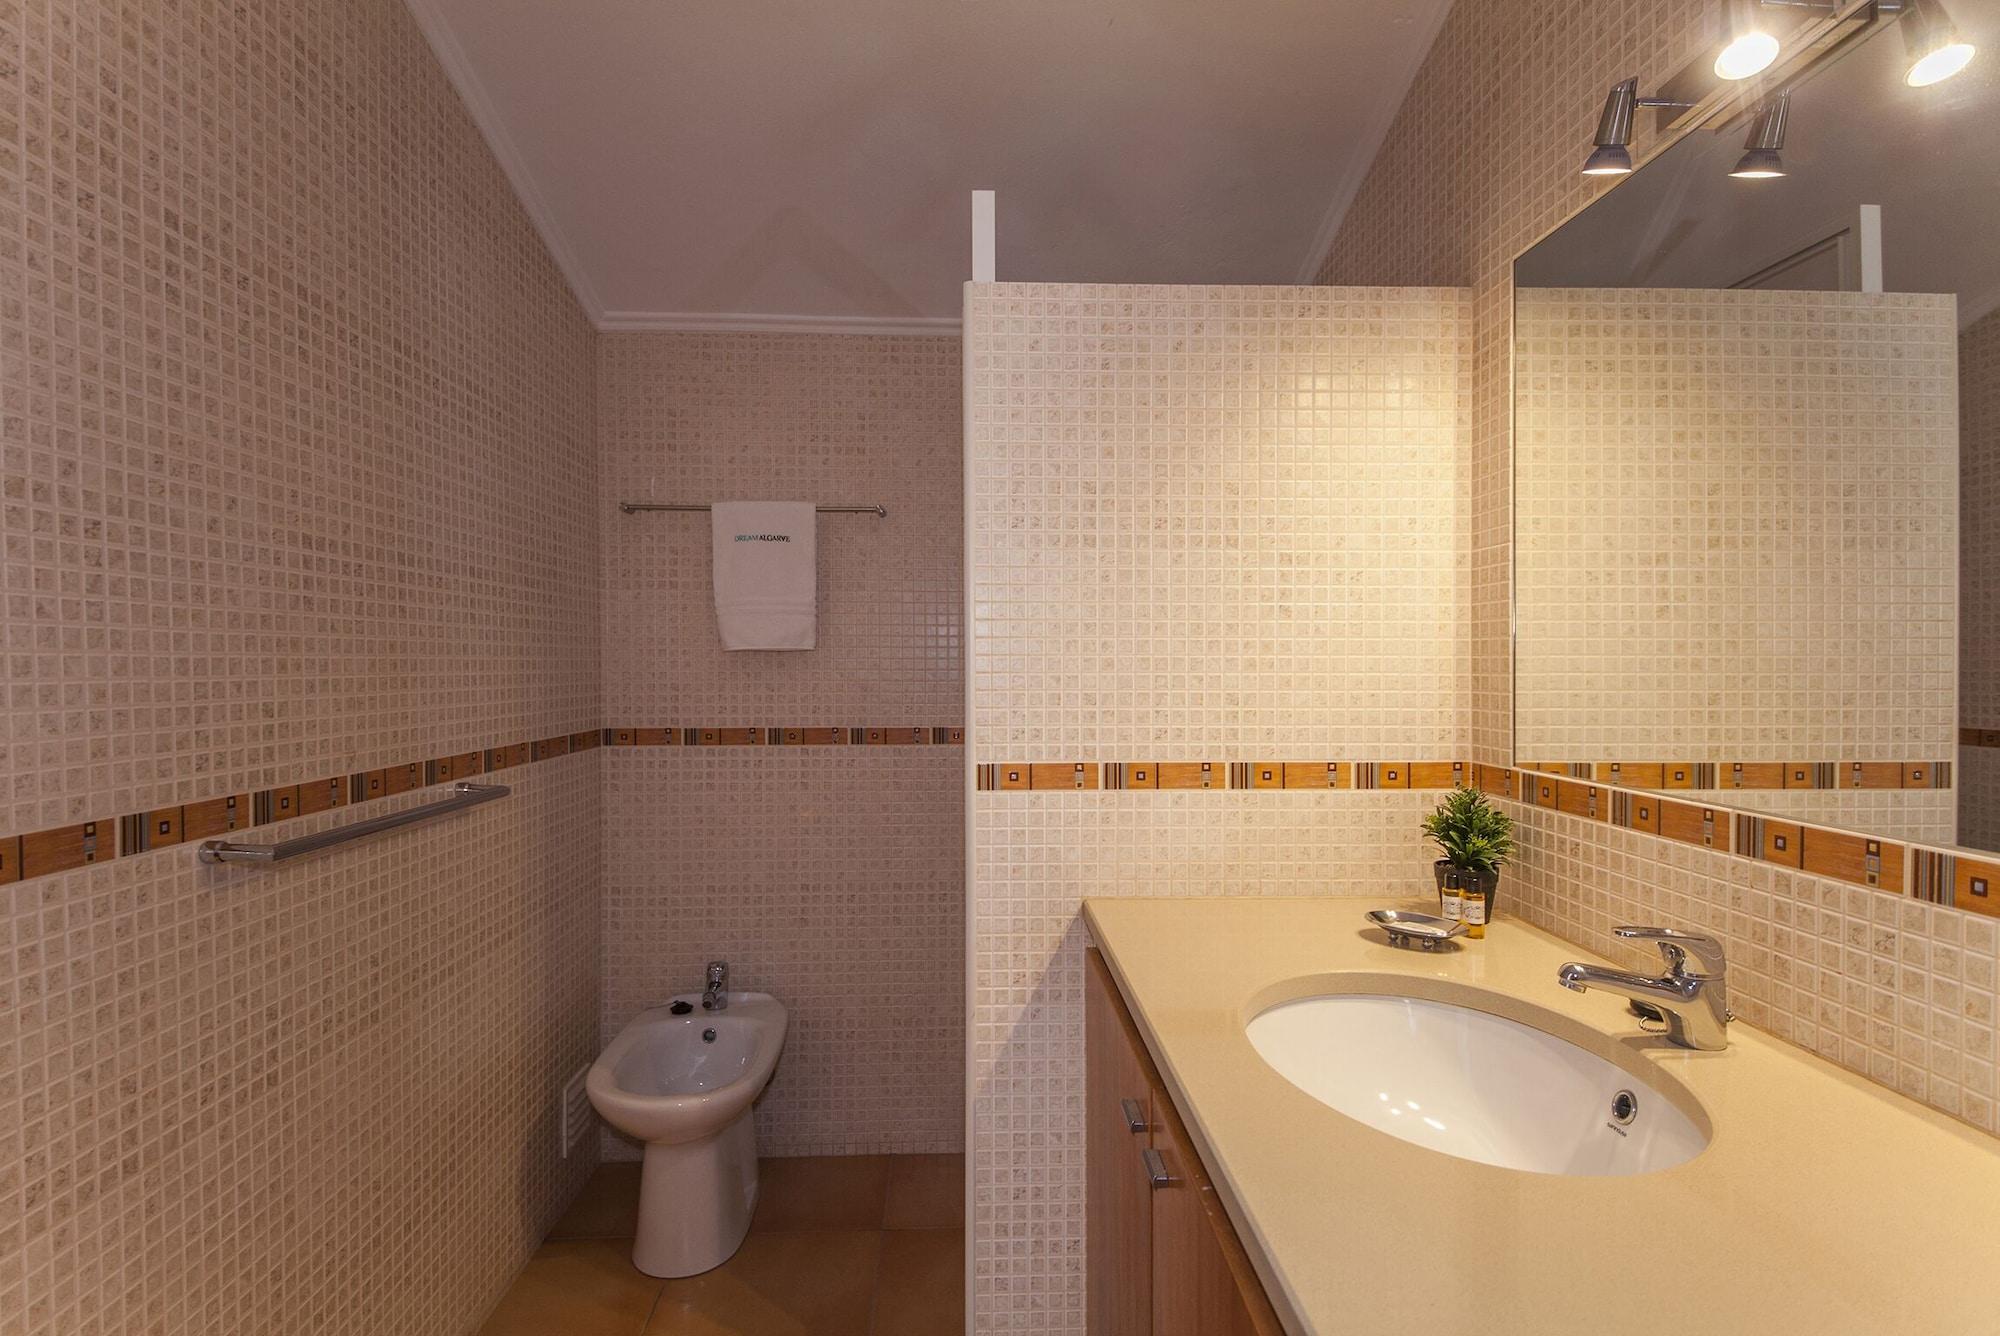 A14 - Cozy Torraltinha Apartment, Lagos